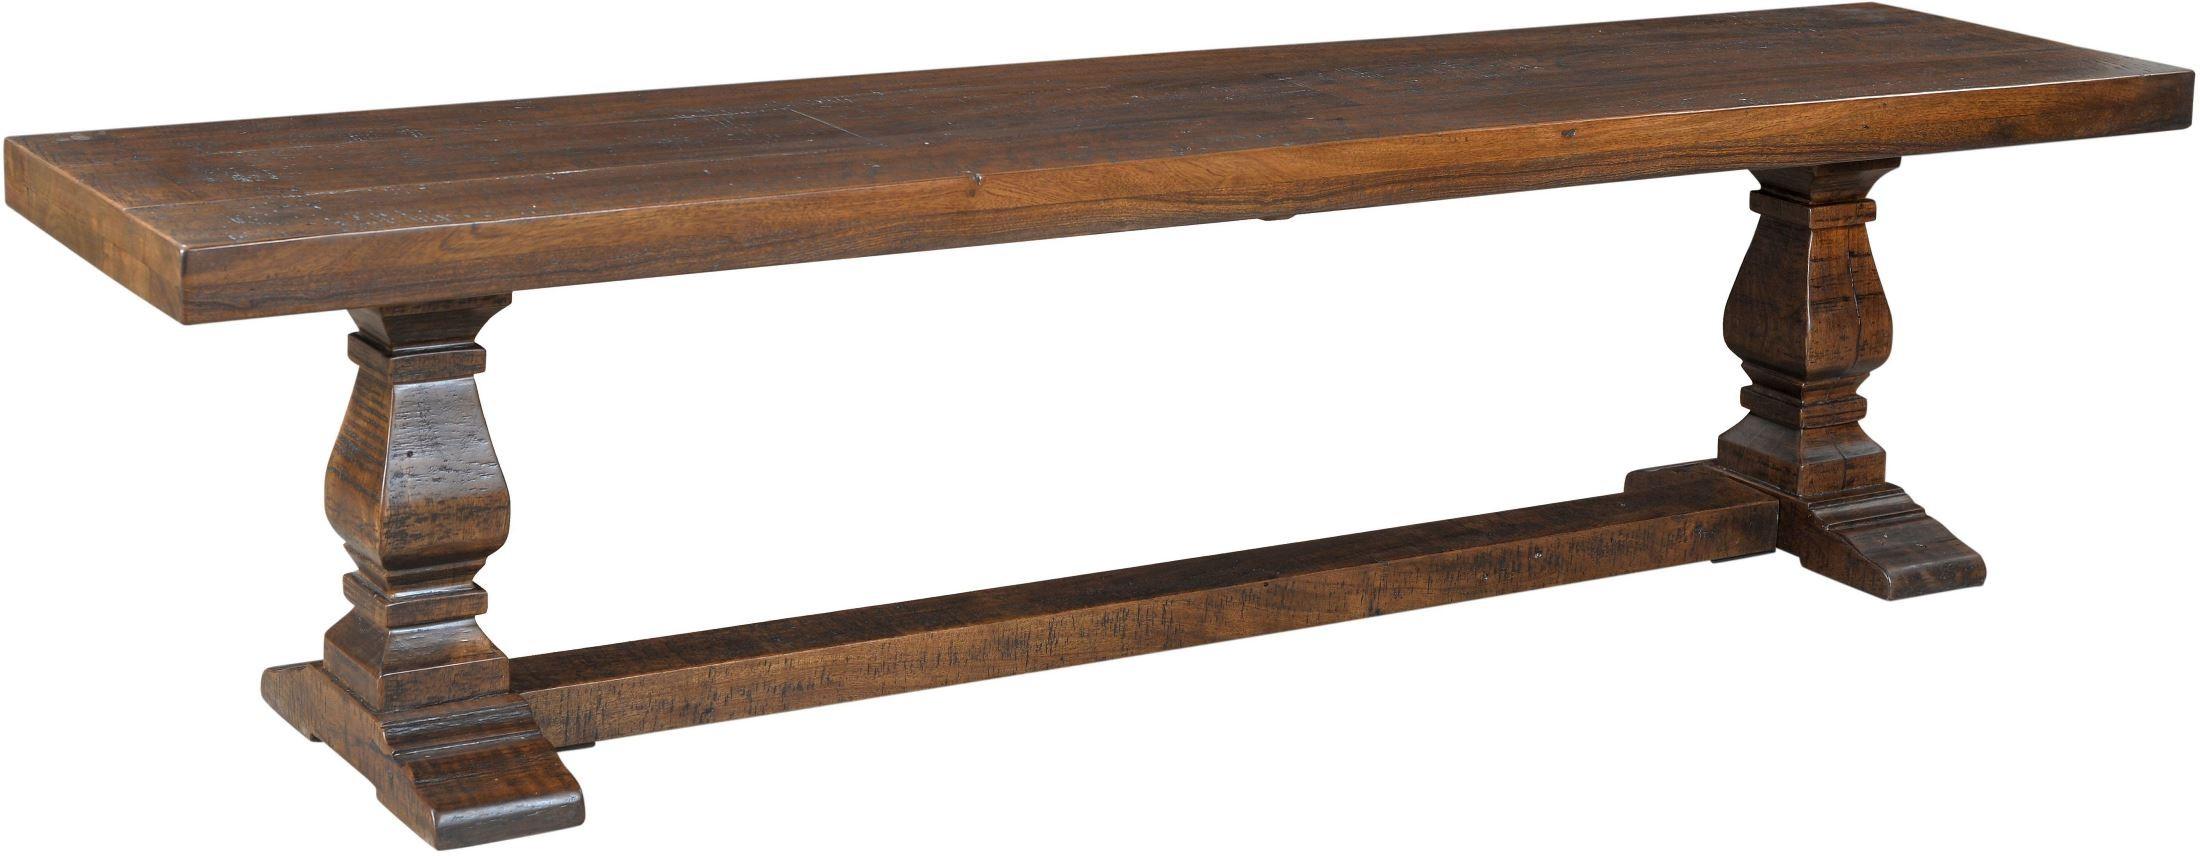 X. Woodbridge Distressed Brown Dining Bench